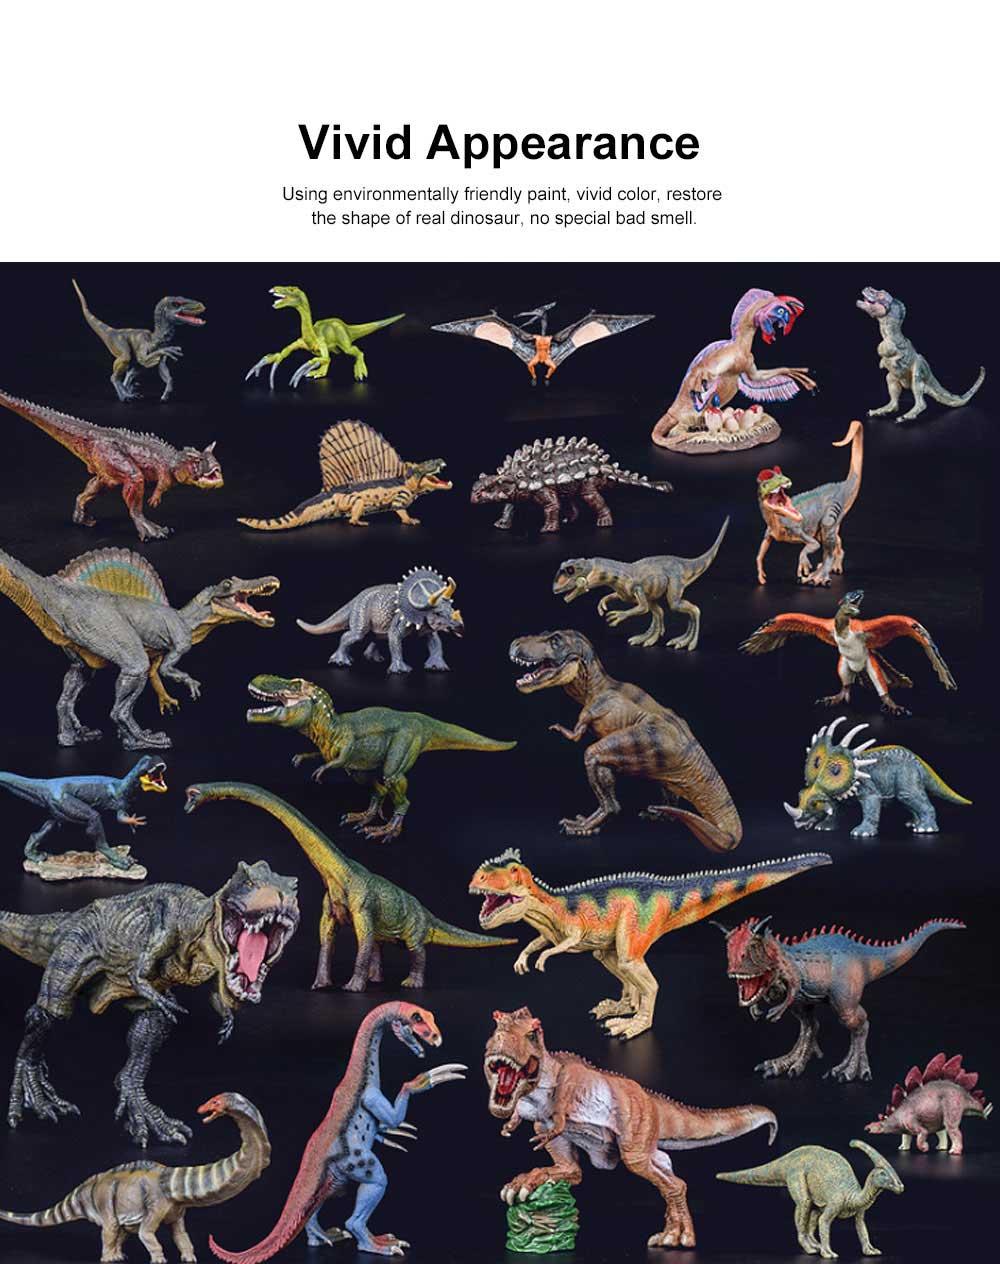 Simulation Halberd Dinosaur Toys, Solid No Stitching PVC Dinosaur Model, Educational Realistic Dinosaur Figures 3